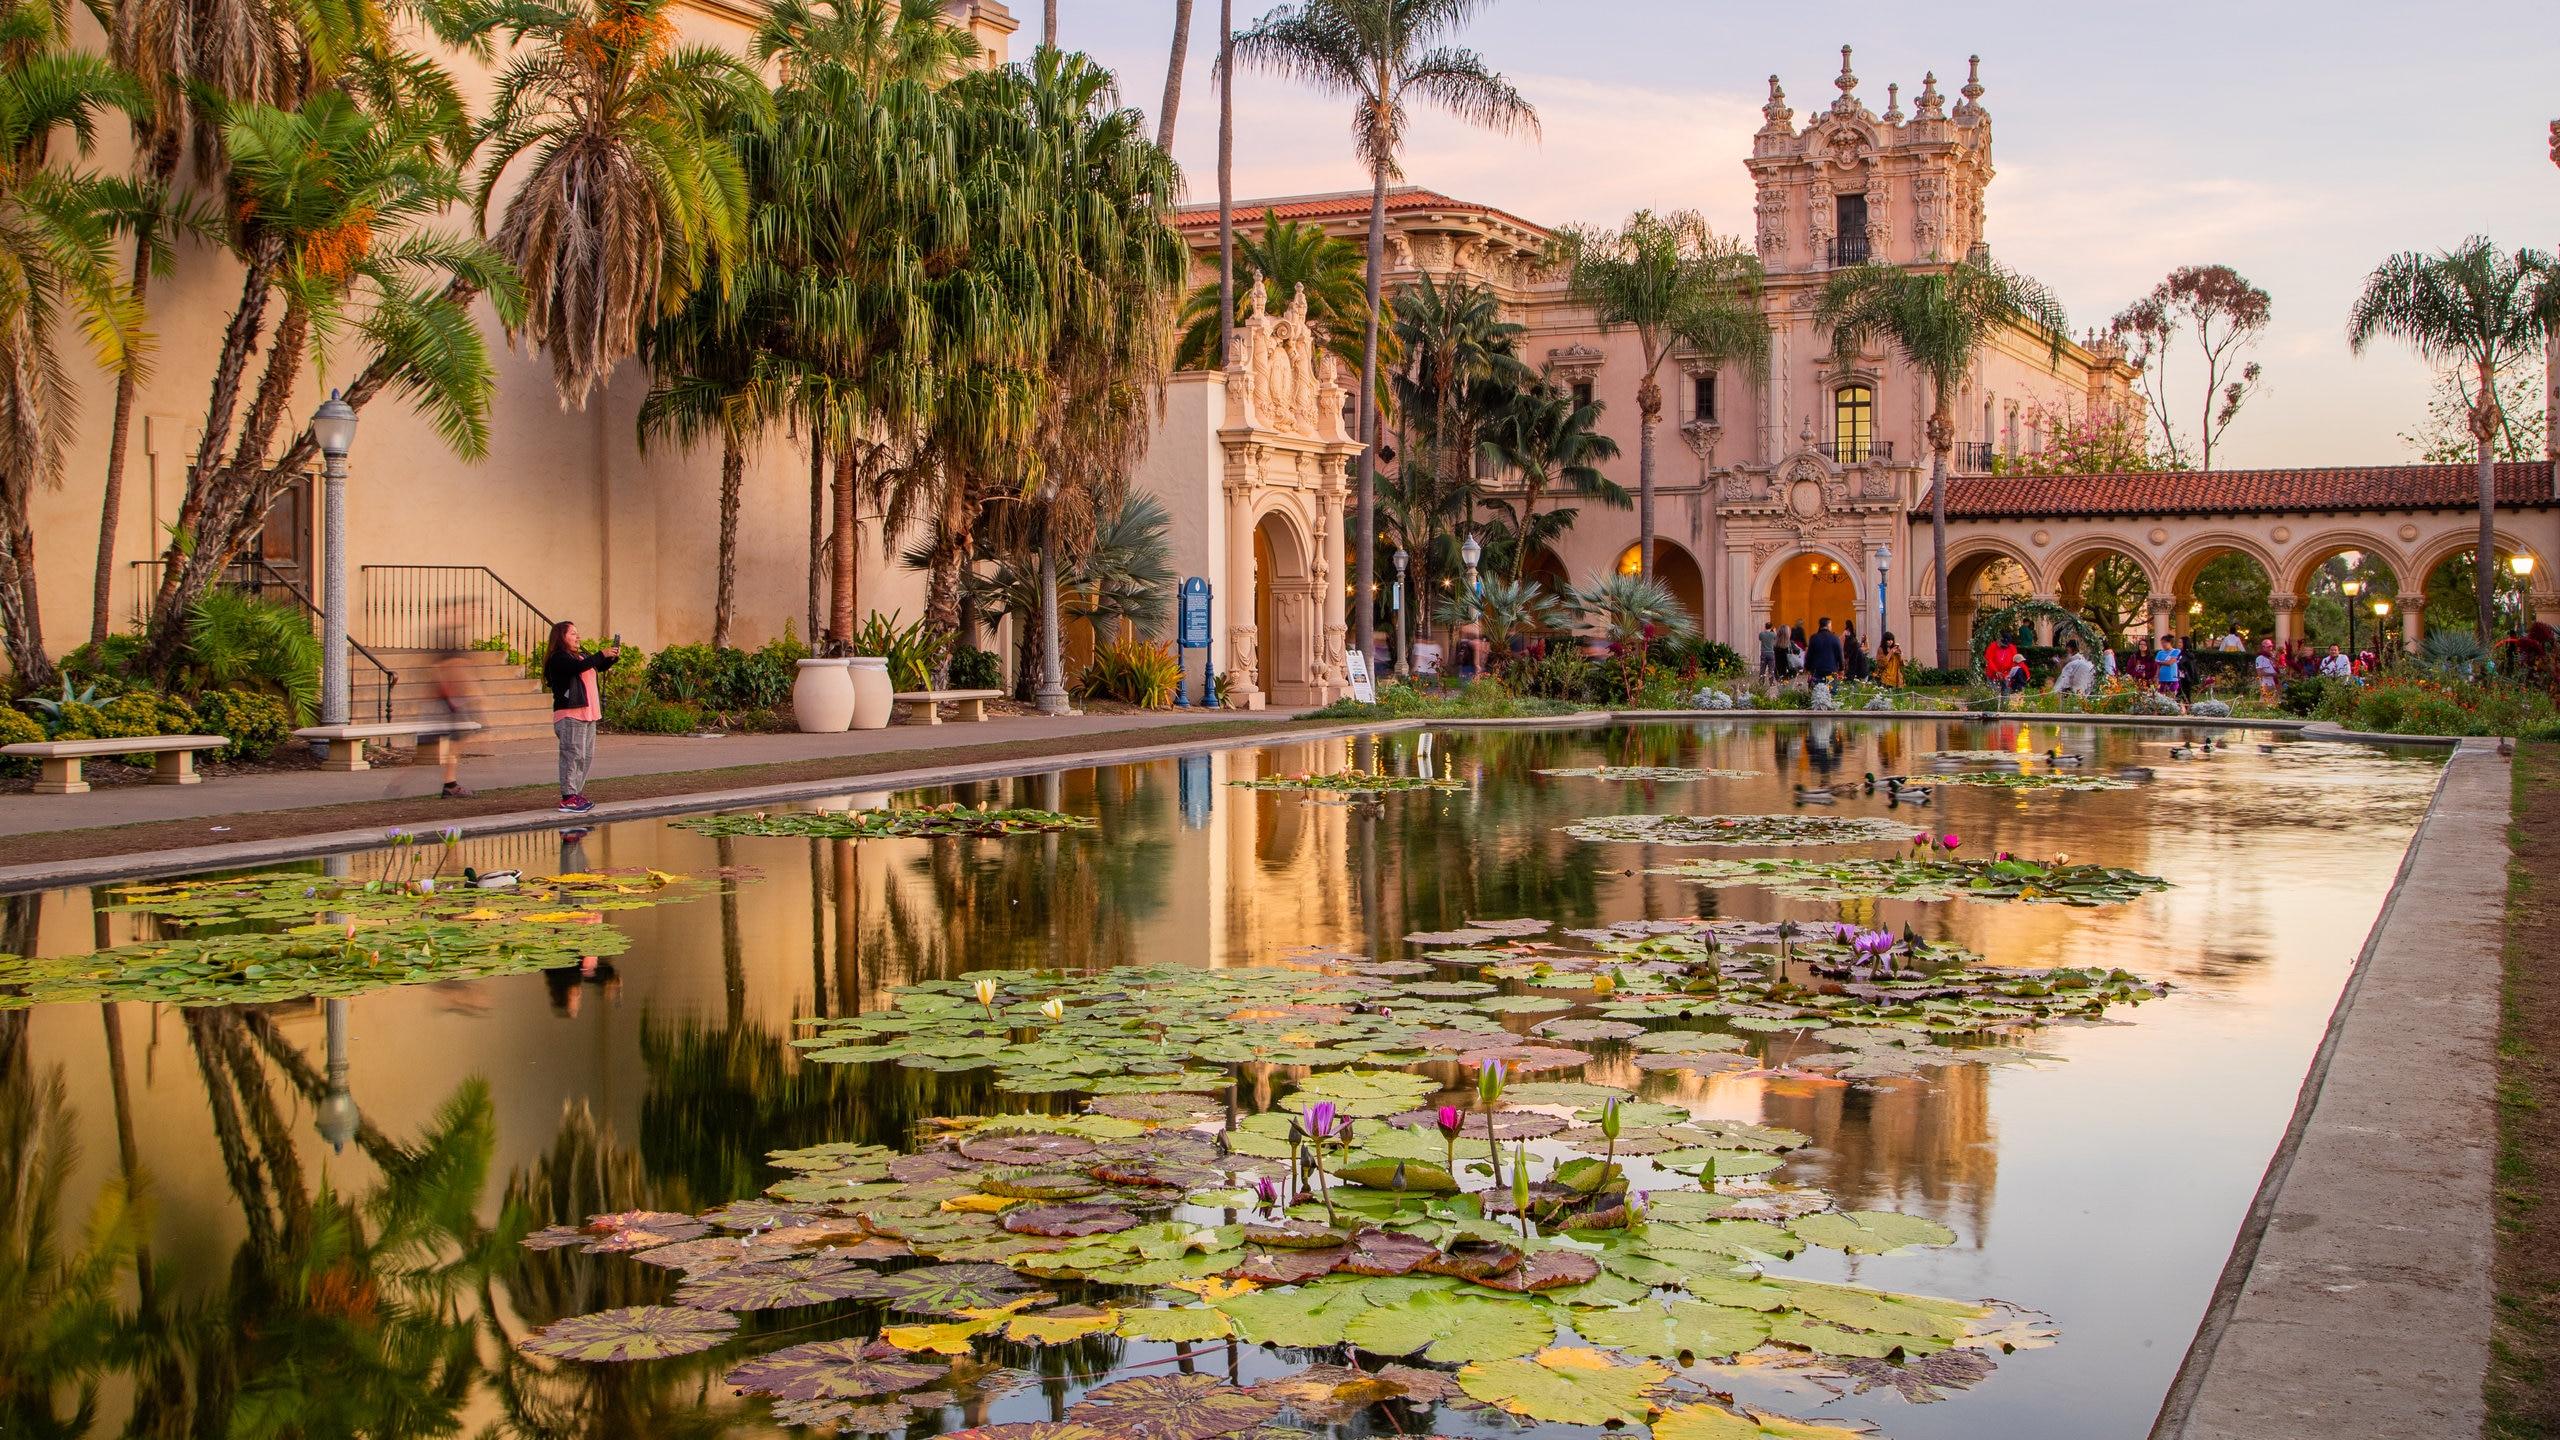 Balboa Park, San Diego, California, United States of America